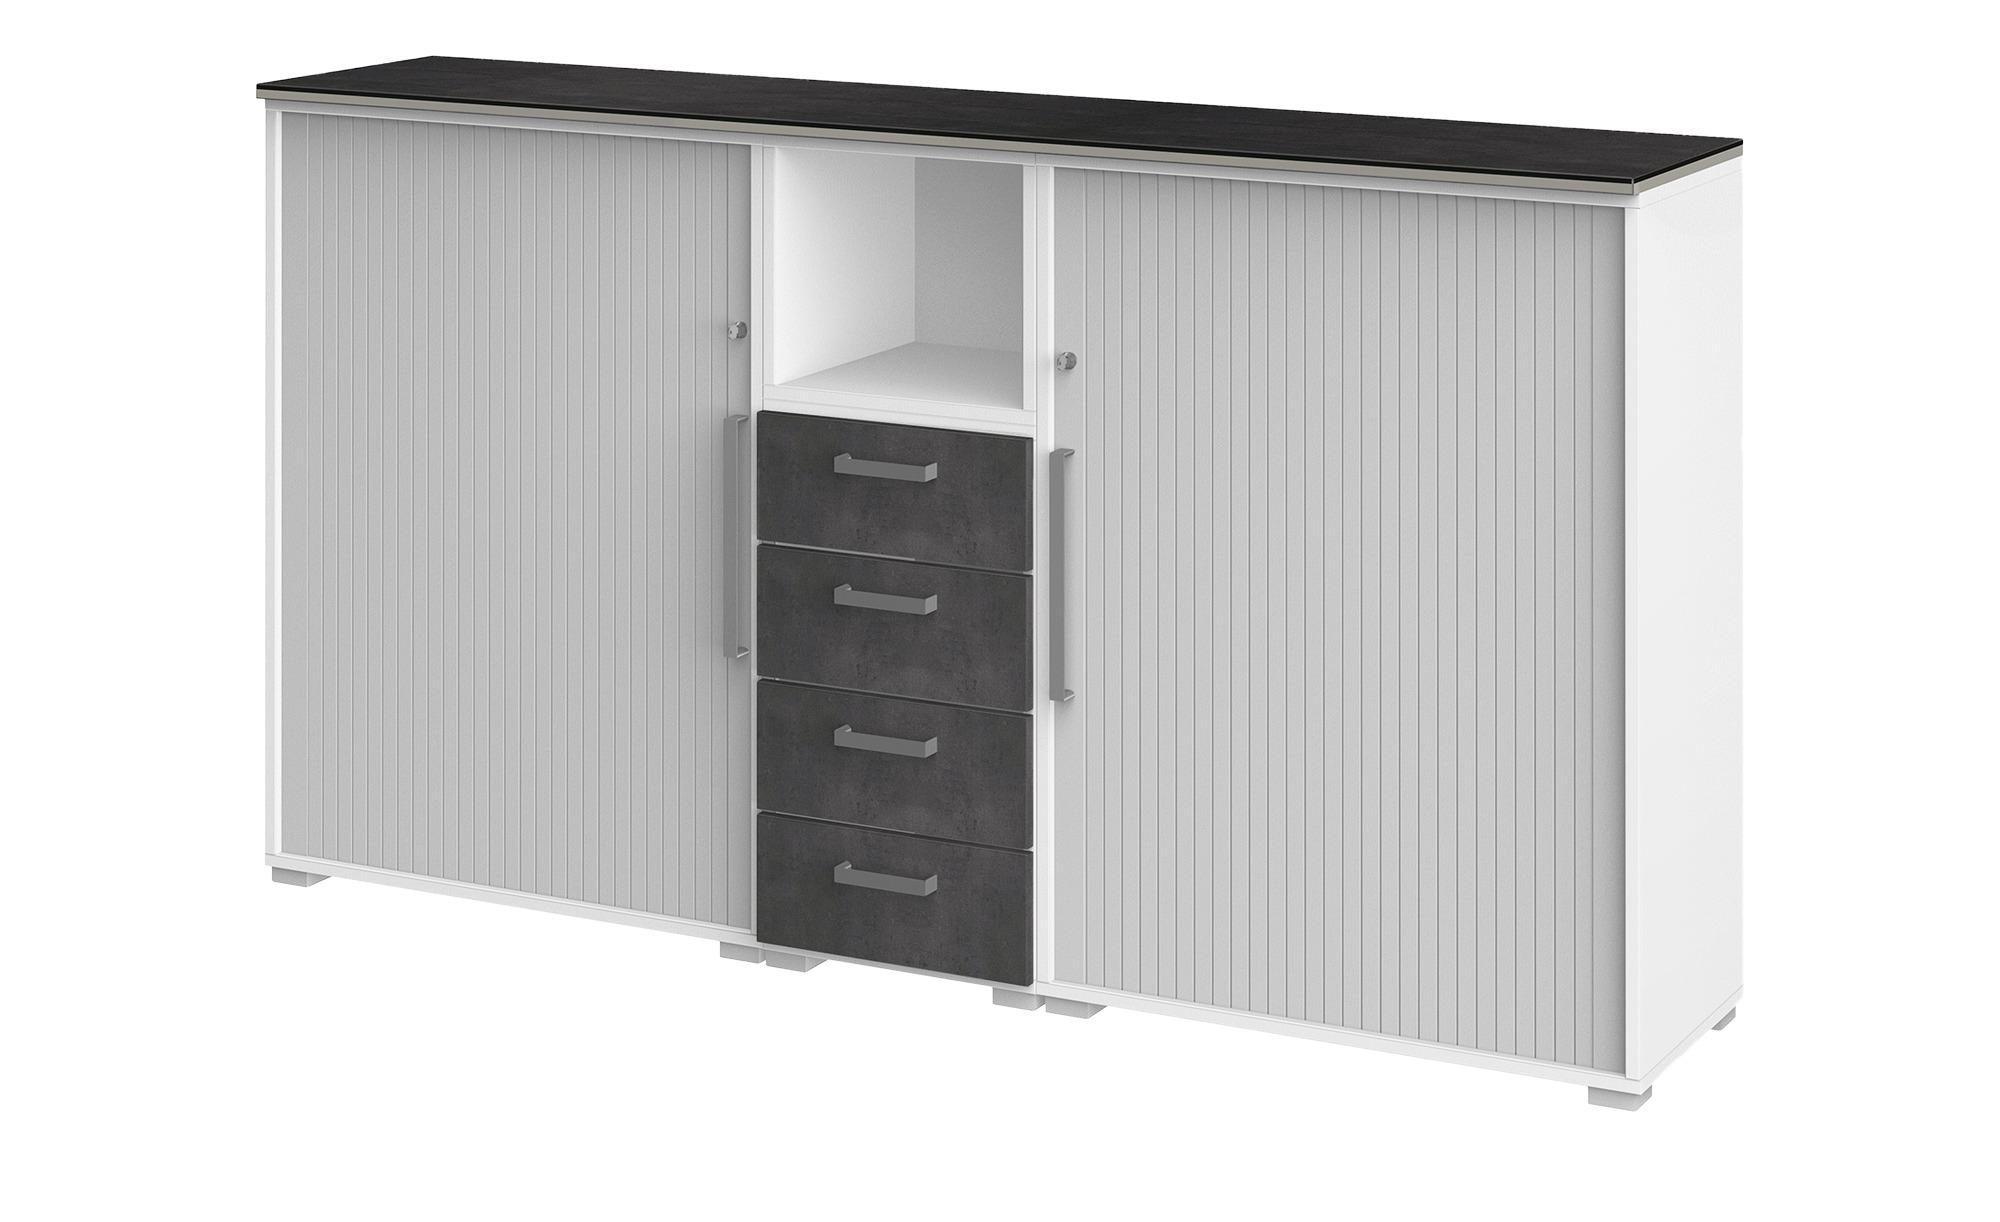 Highboard  Objekt plus ¦ grau Kommoden & Sideboards > Highboards - Höffner günstig online kaufen